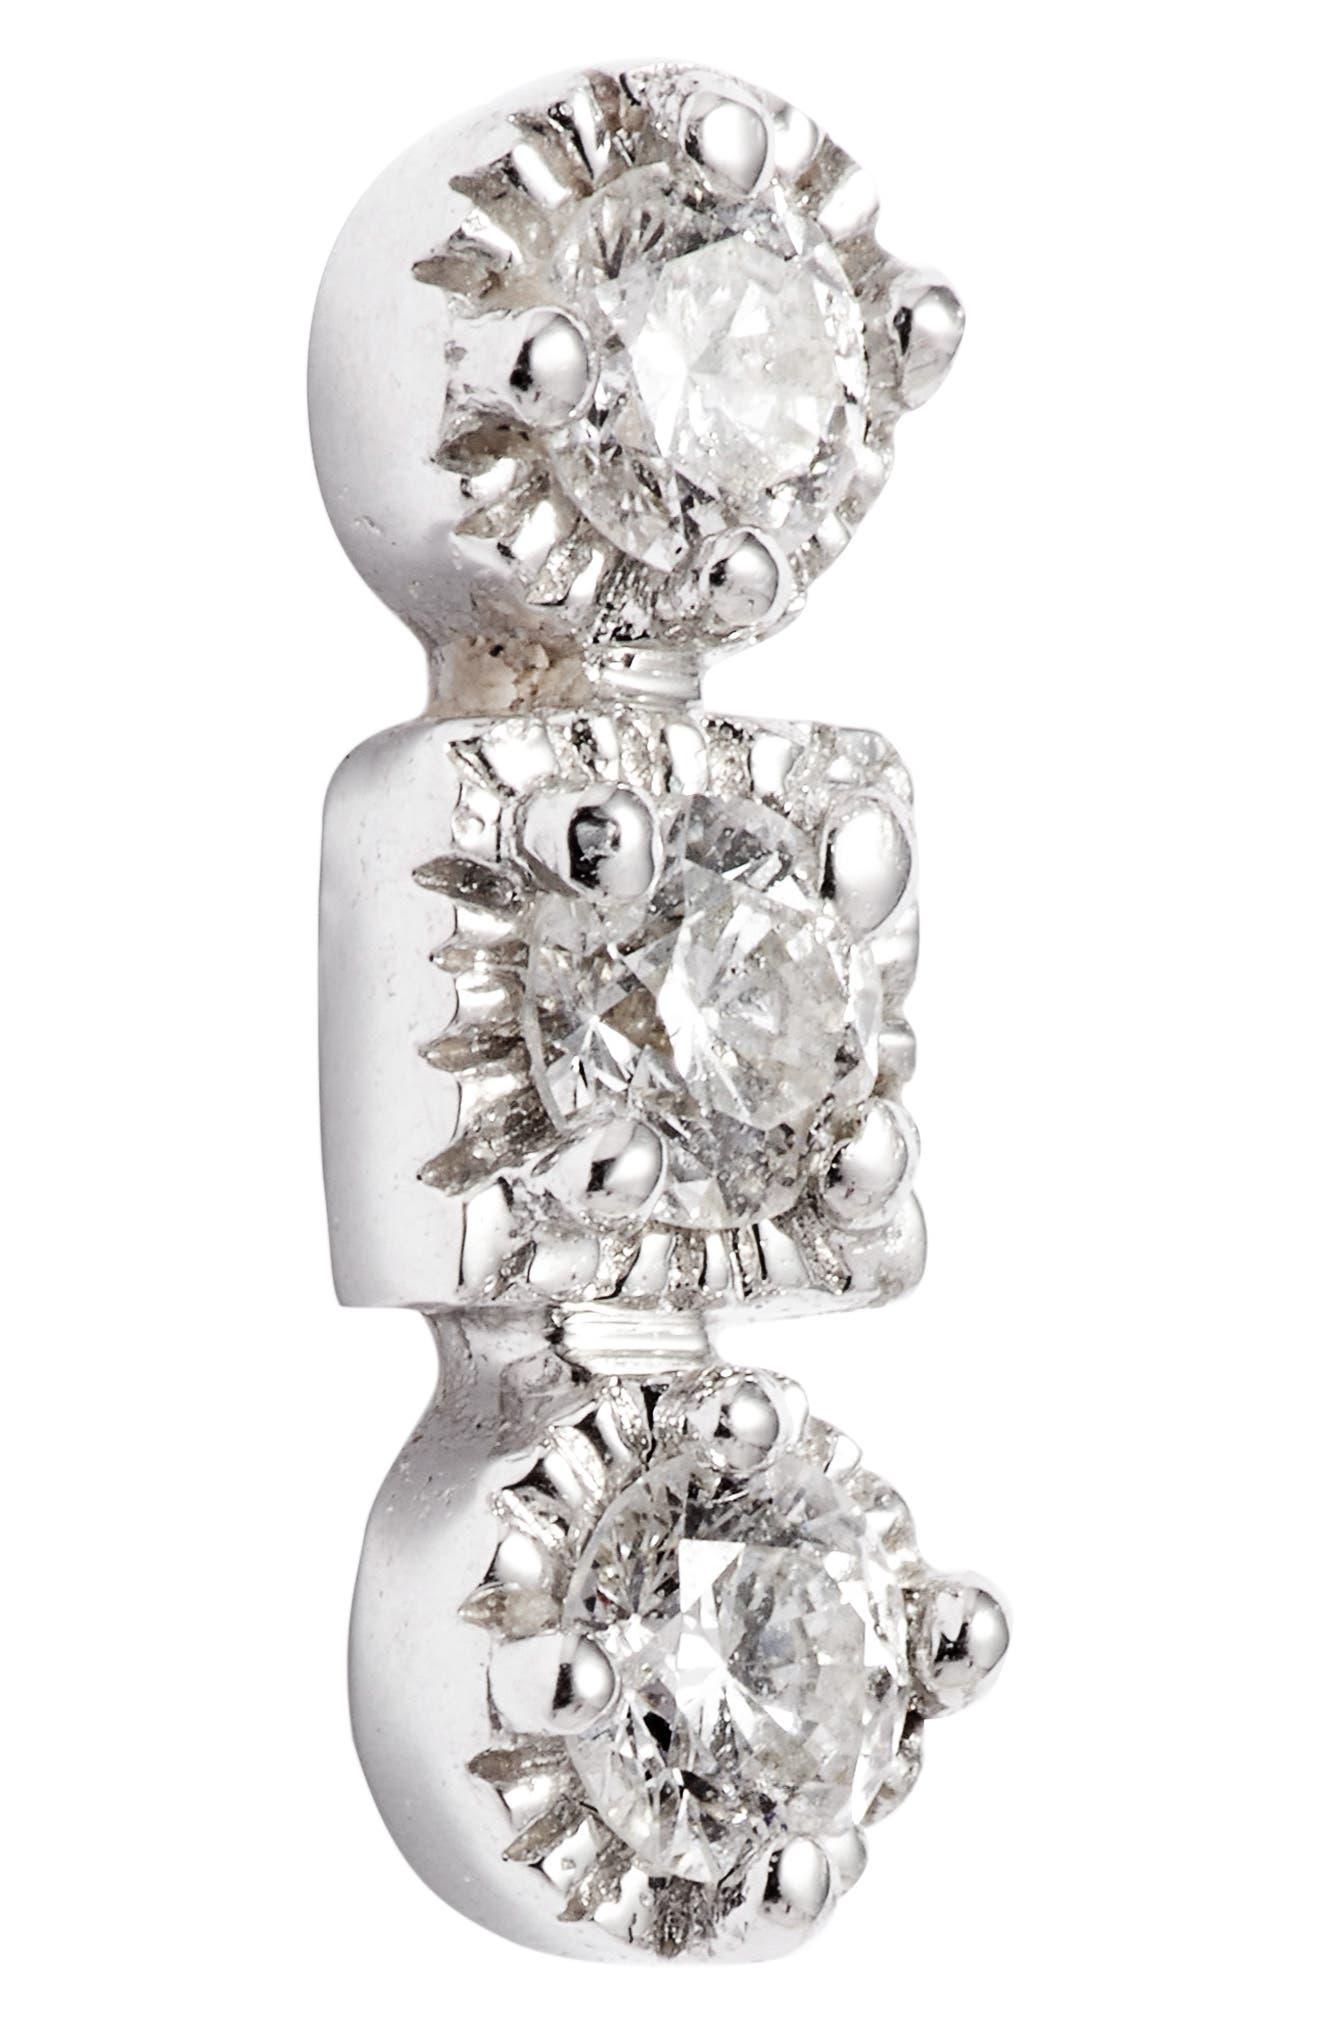 Maya 3-Stone Stud Earrings,                             Alternate thumbnail 5, color,                             WHITE GOLD/ DIAMOND